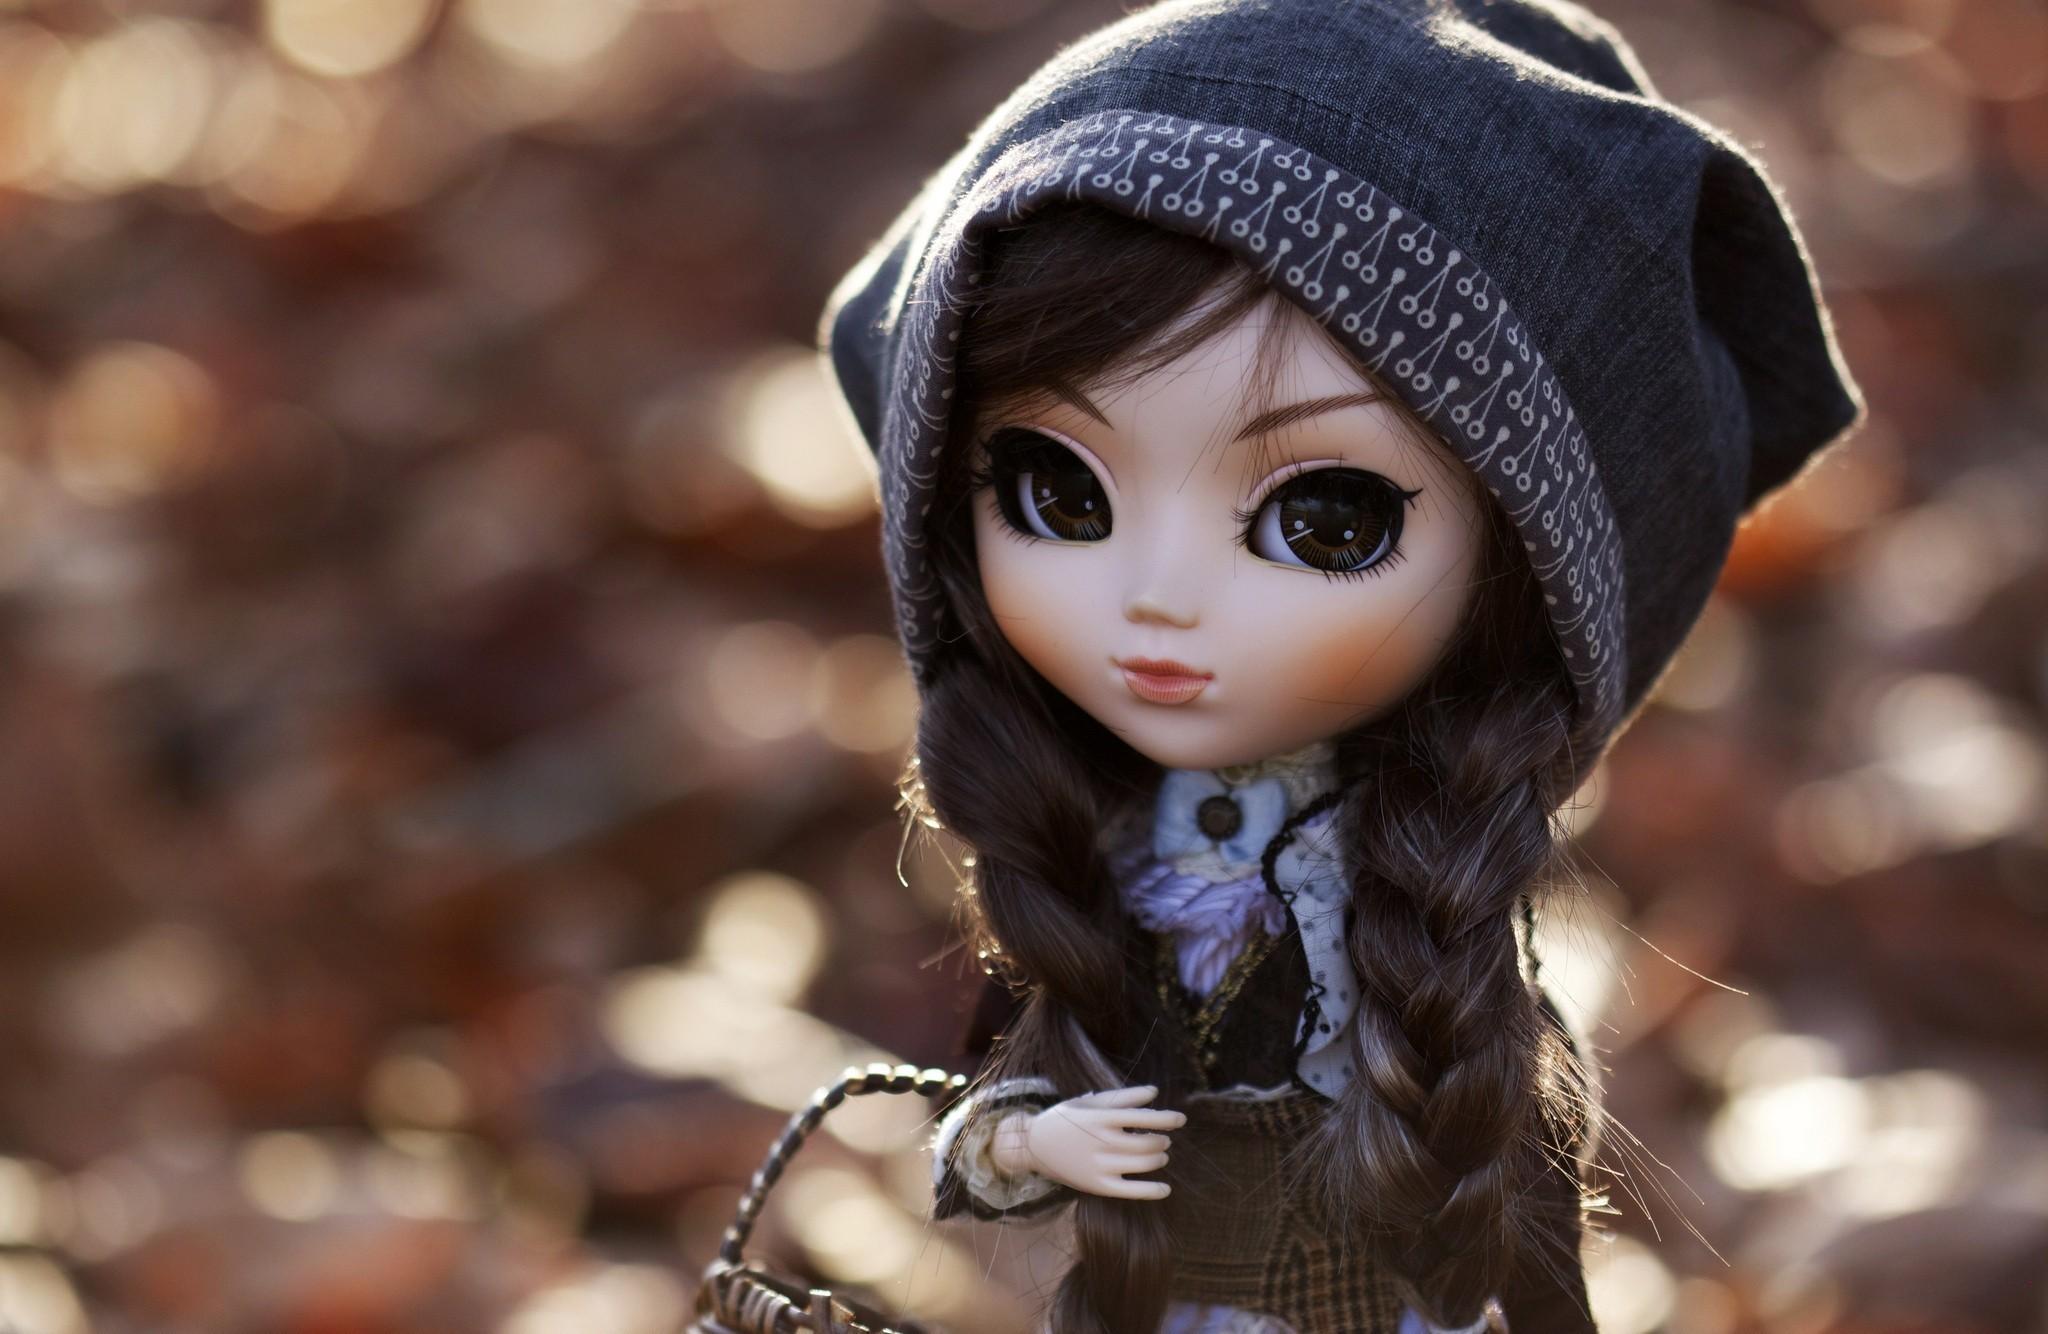 toys doll little girls dolls toy redhead girl winter autumn mood